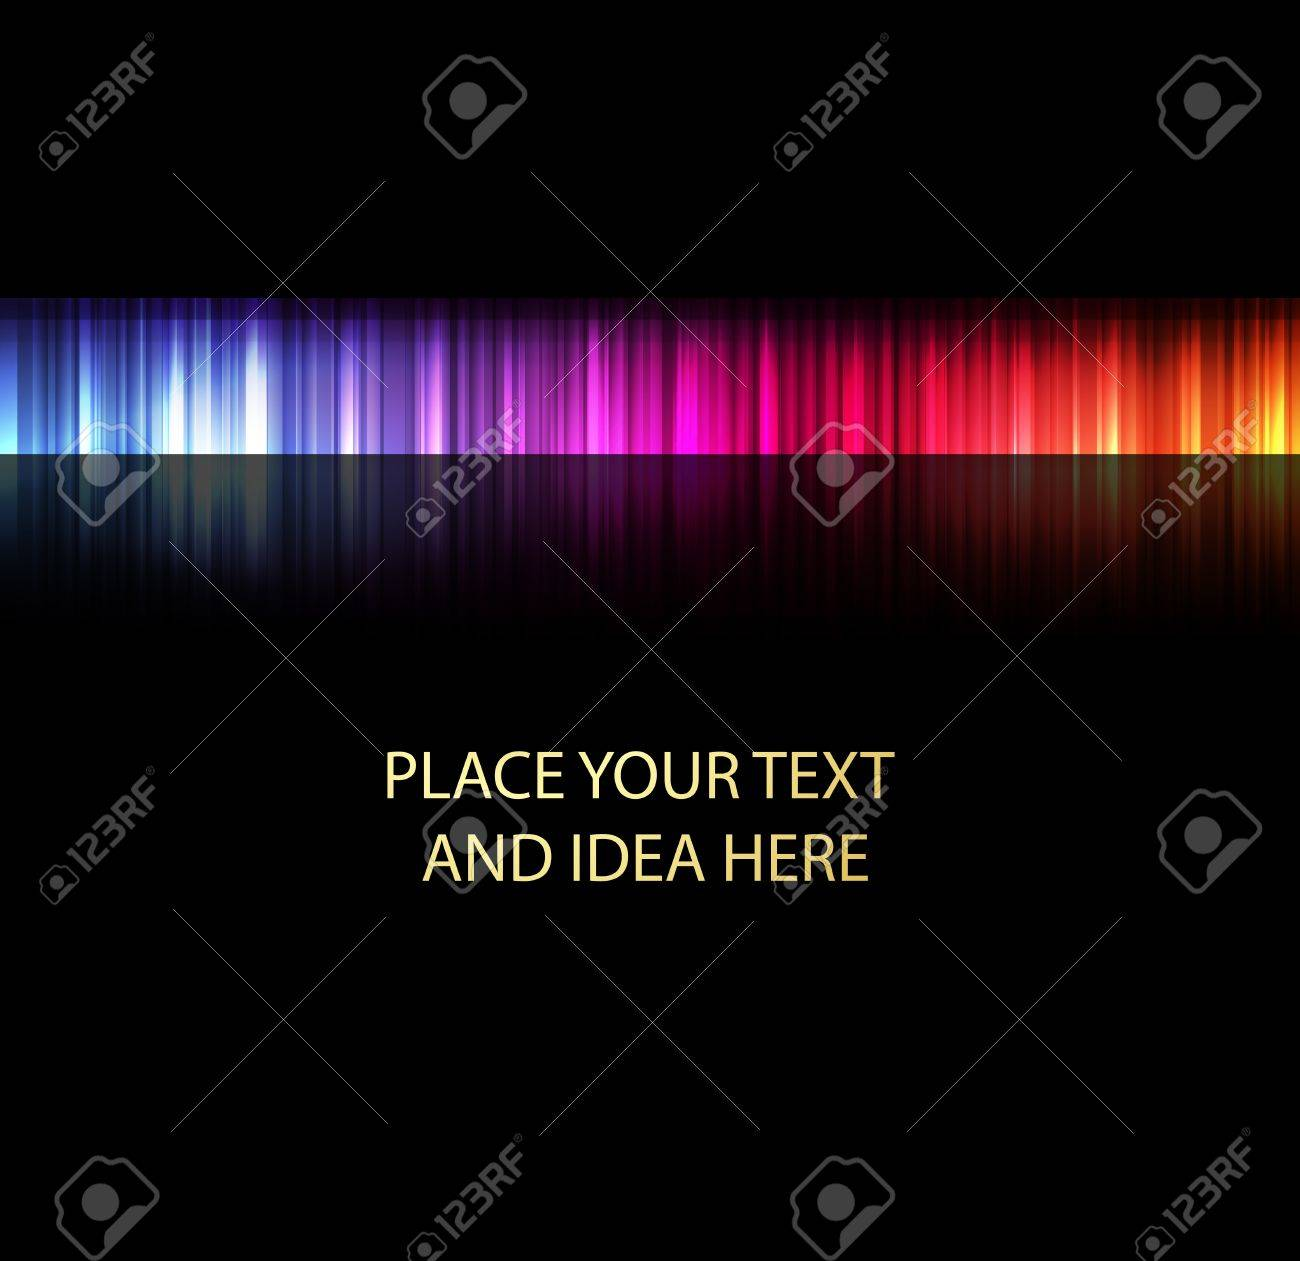 Neon abstract lines design on dark background vector Stock Vector - 11058955